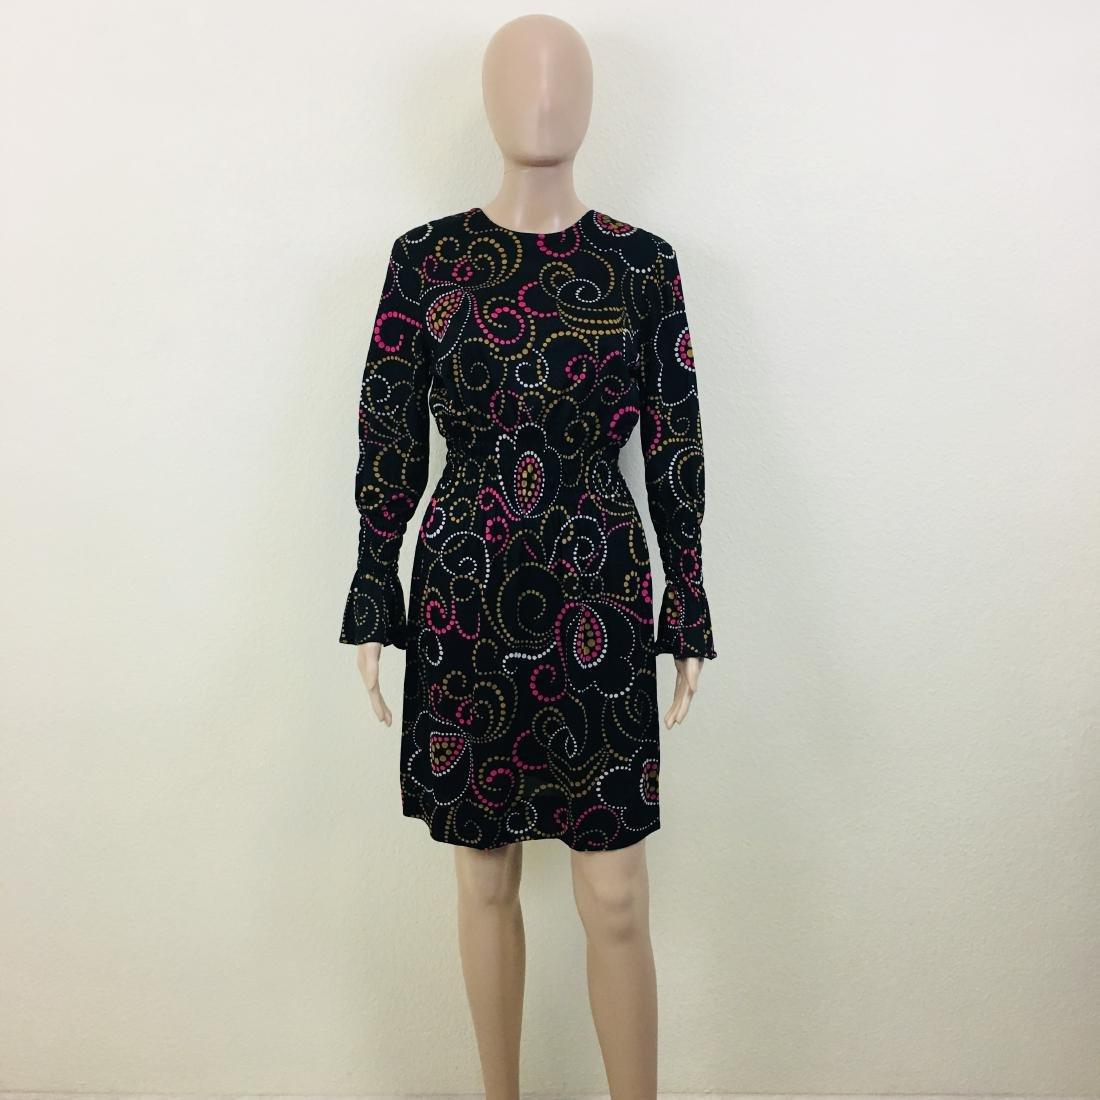 Vintage Women's Black Dress - 2